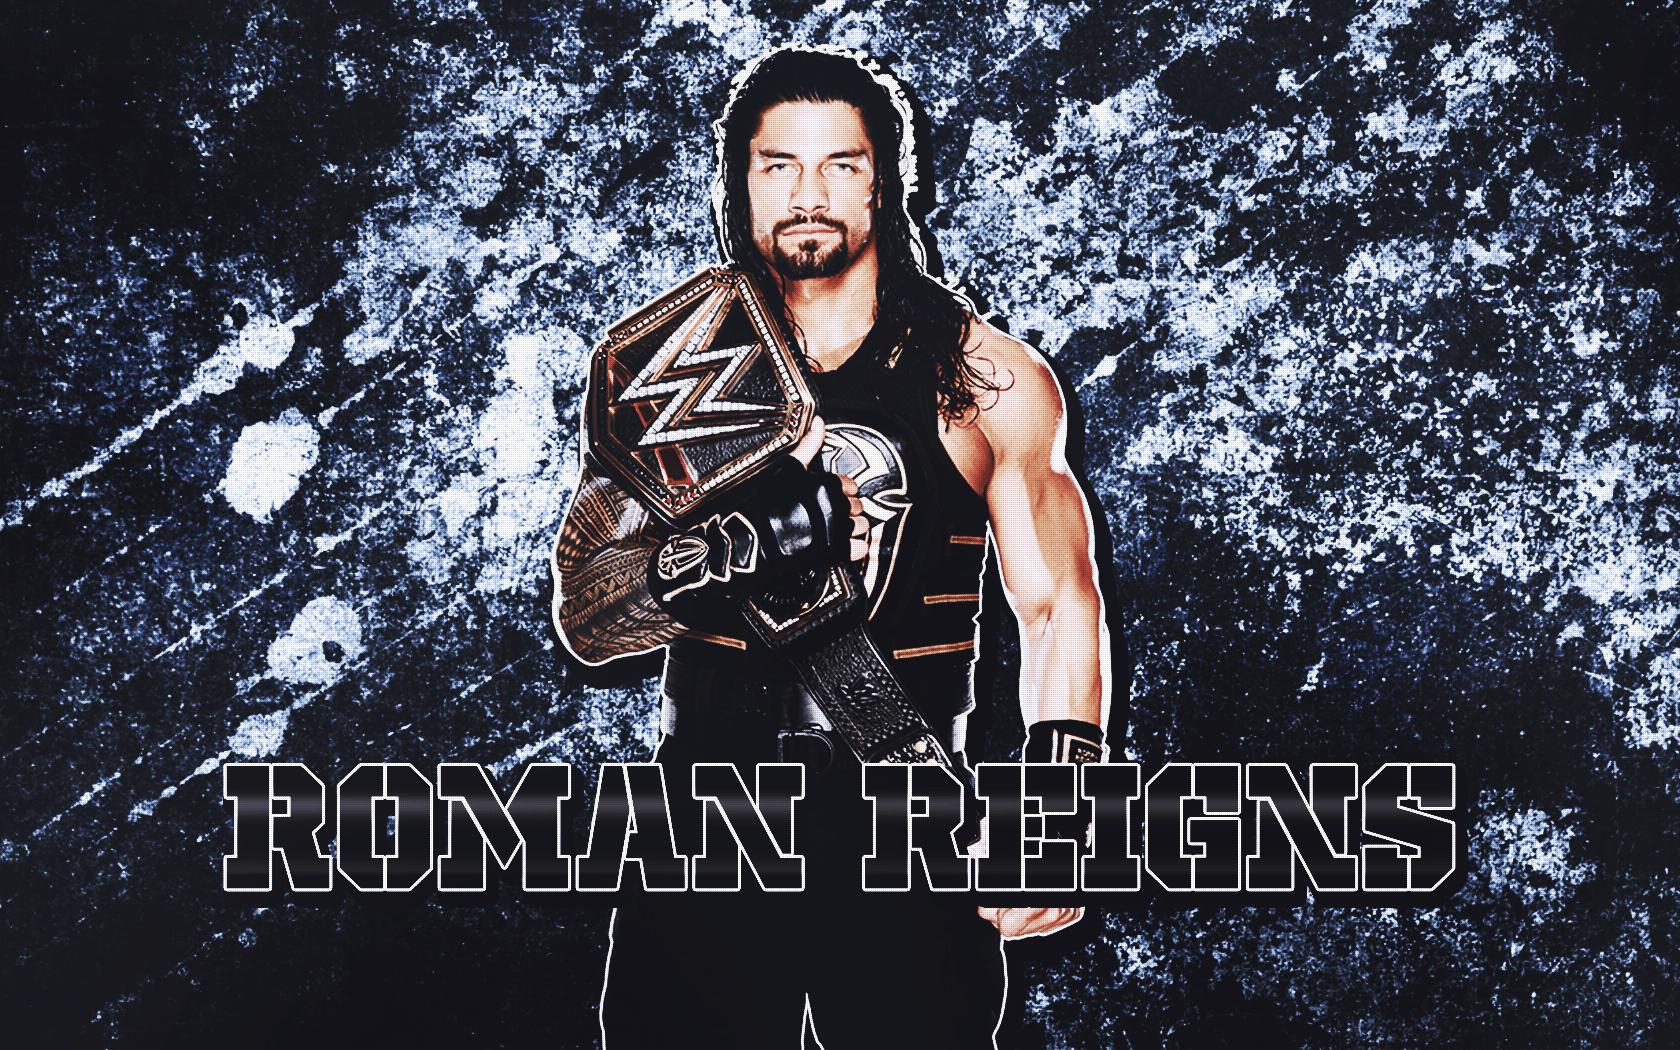 Hd Roman Reigns Wallpaper: Roman Reigns Championship Wallpapers